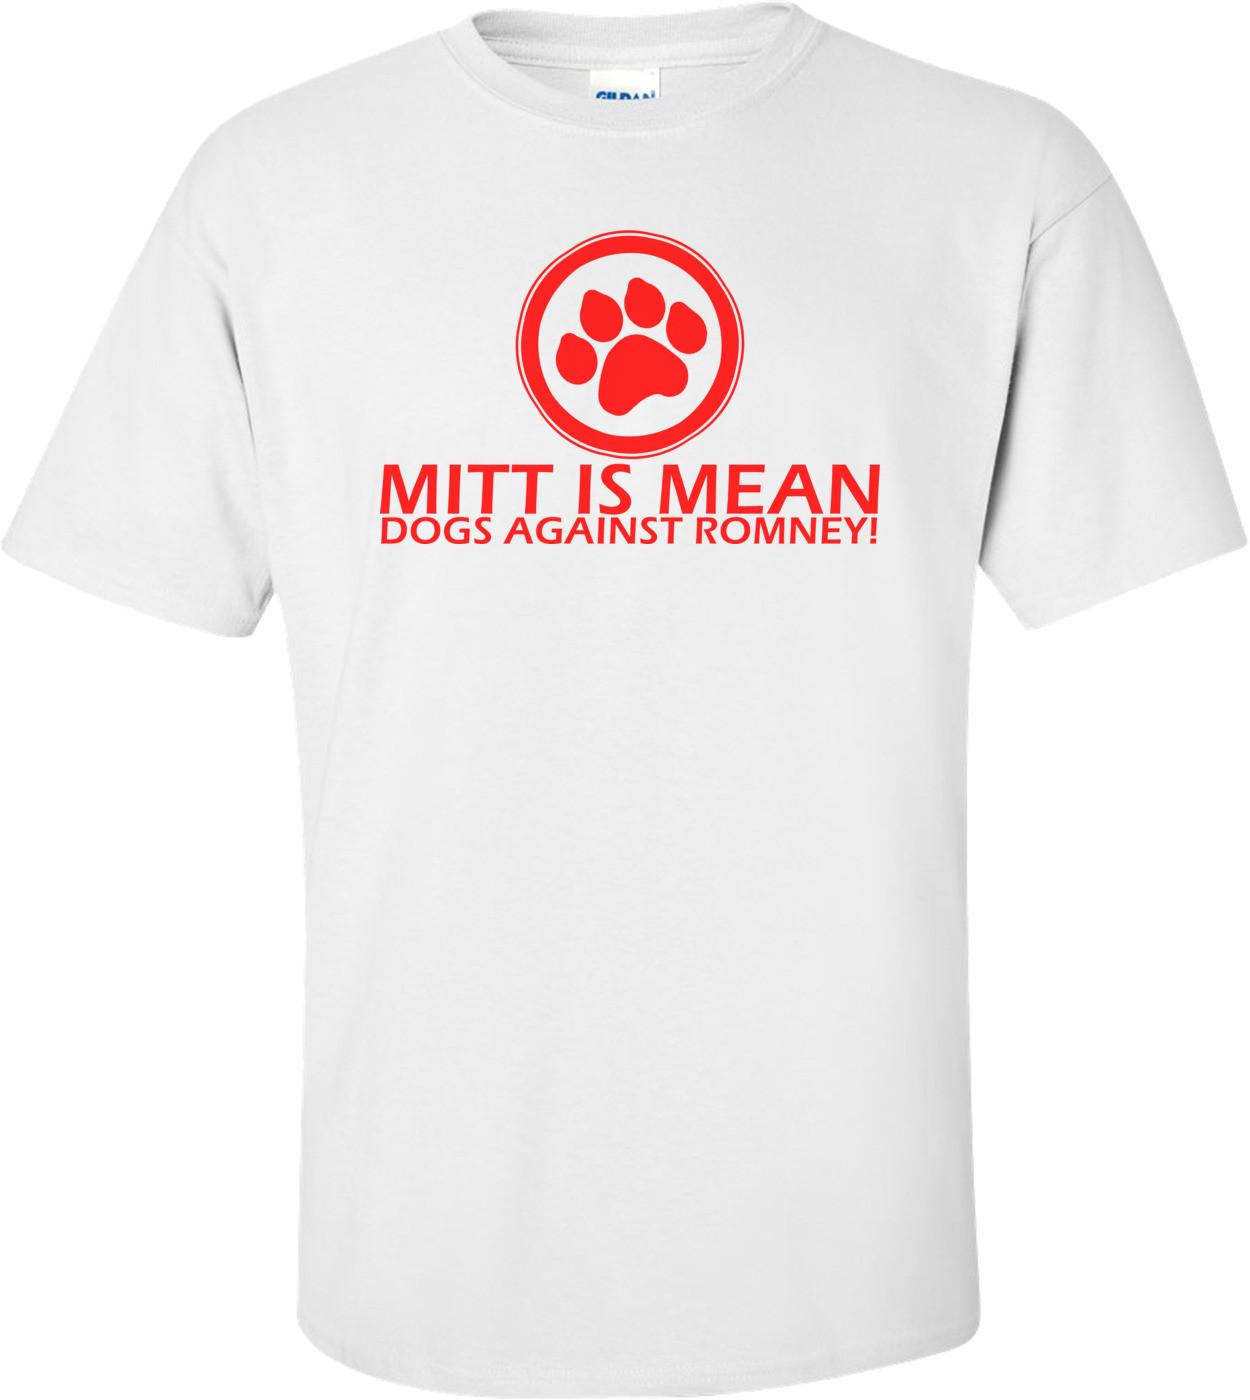 Mitt Is Mean Dogs Against Romney - Anti Mitt Romney Shirt